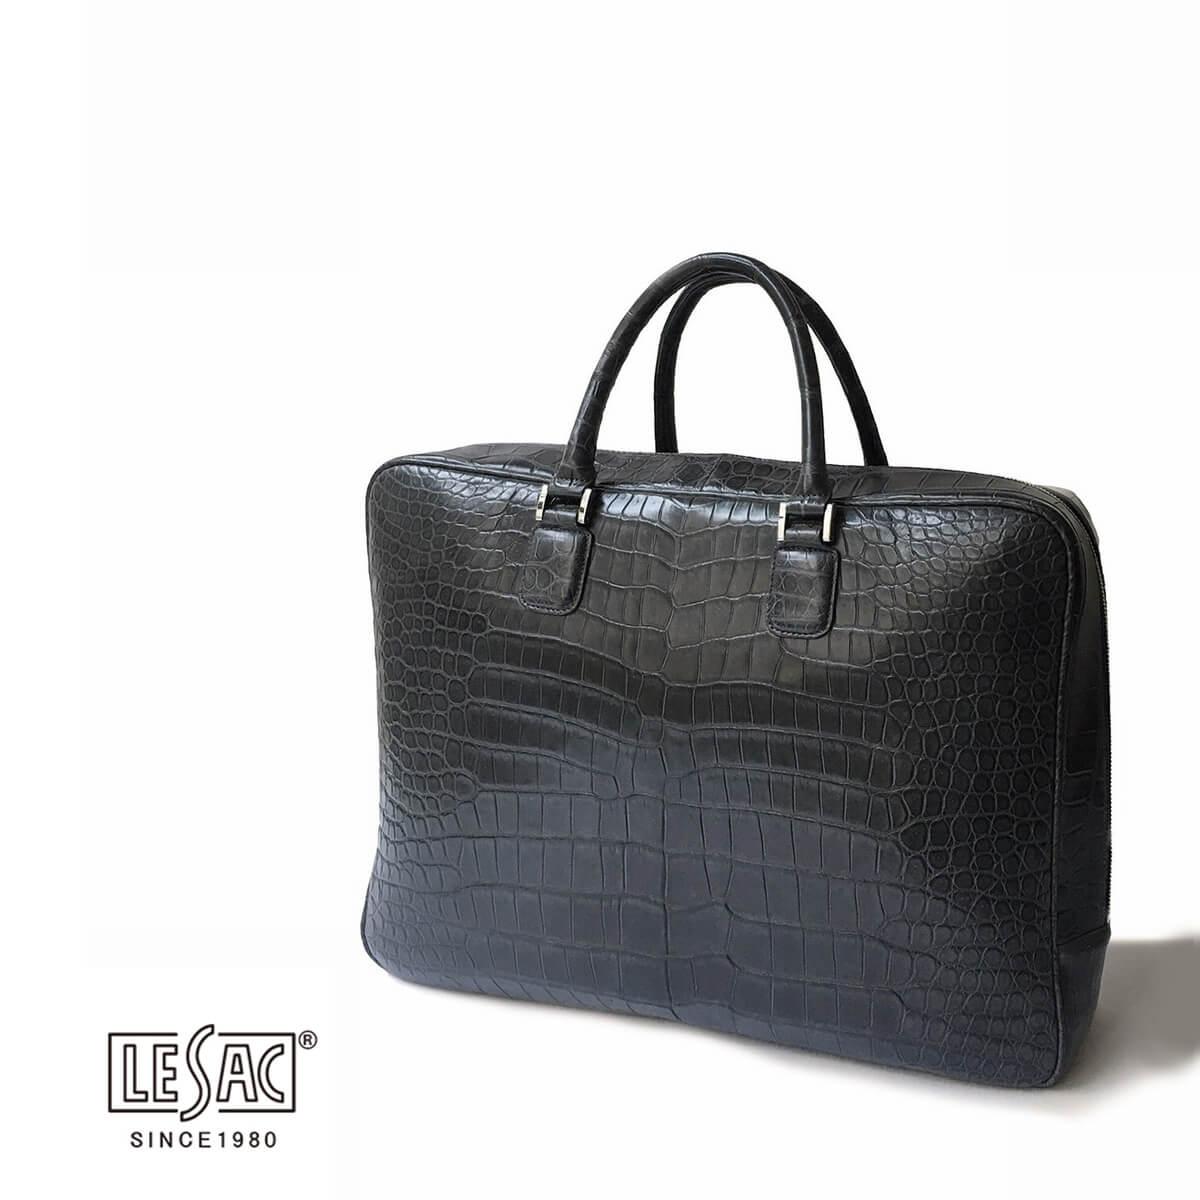 LeSac (レザック) レザック クロコダイルブリーフケース ポロサス メンズ レディース 大容量 チャコールグレー 本革 エキゾチックレザー ブランド カジュアル ビジネス ブランド